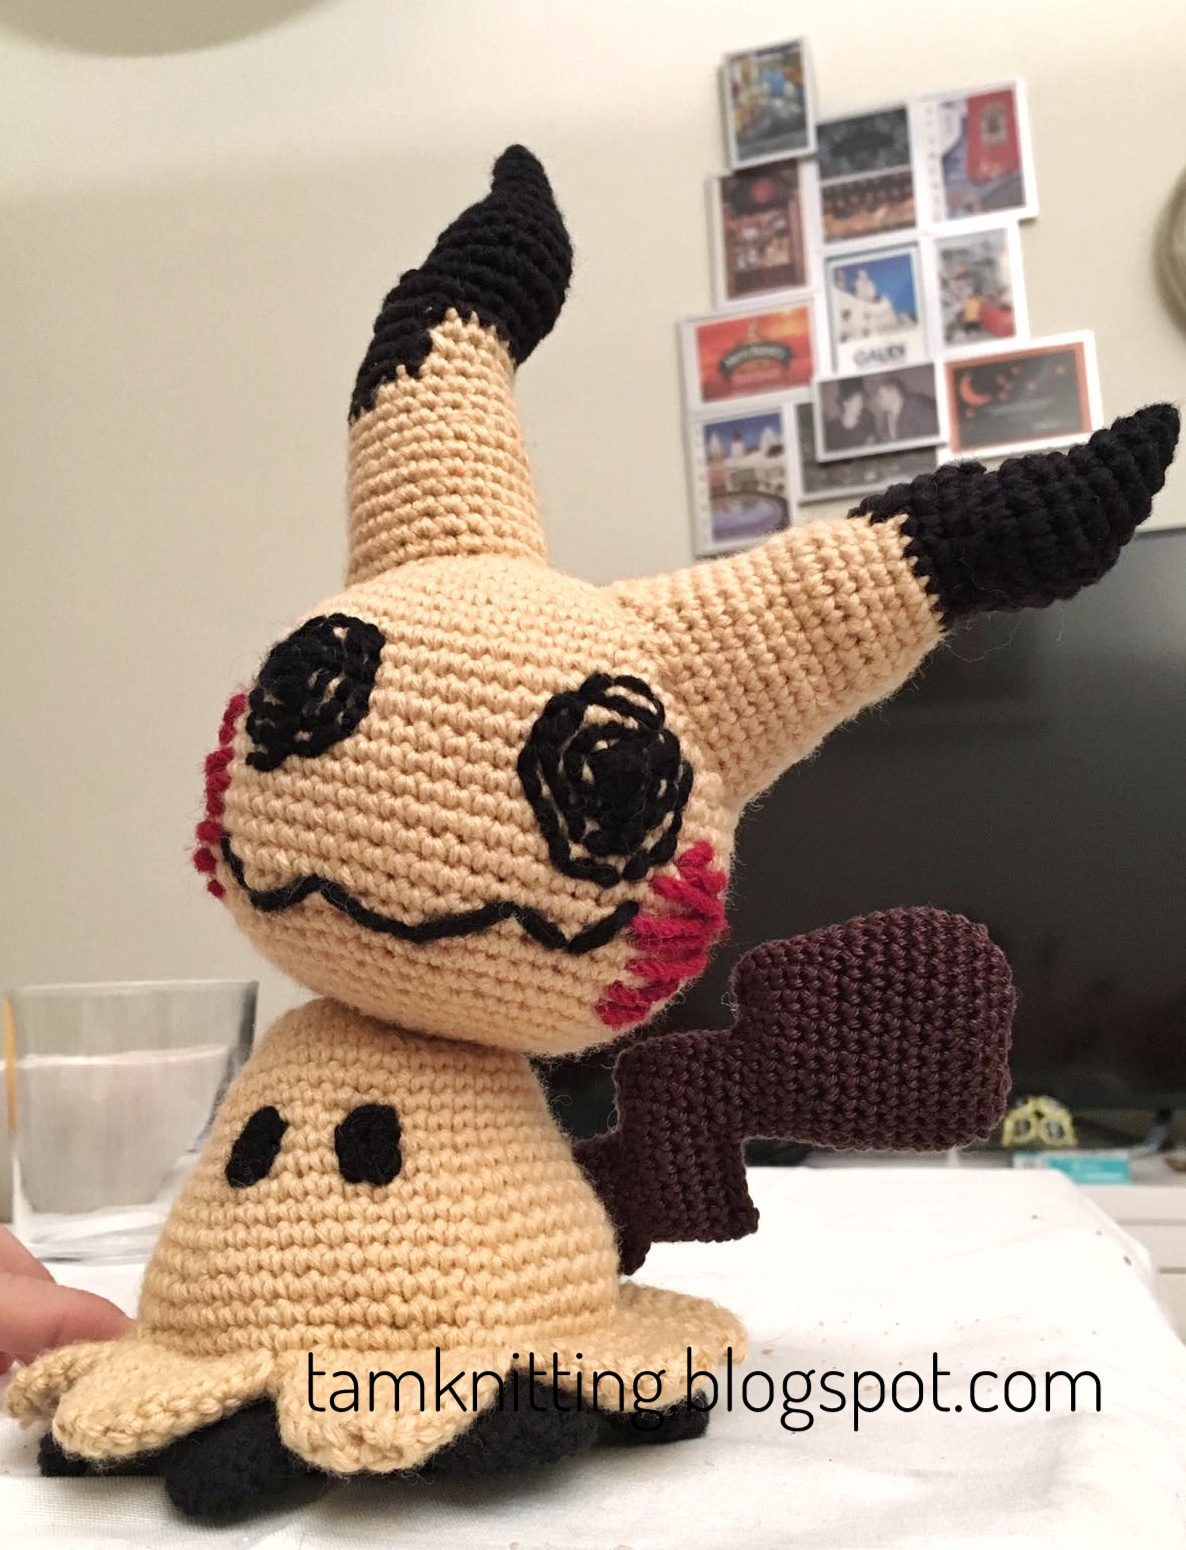 Crochet Pokemon Patterns (com imagens) | Crochet diy, Projetos de ... | 1550x1186